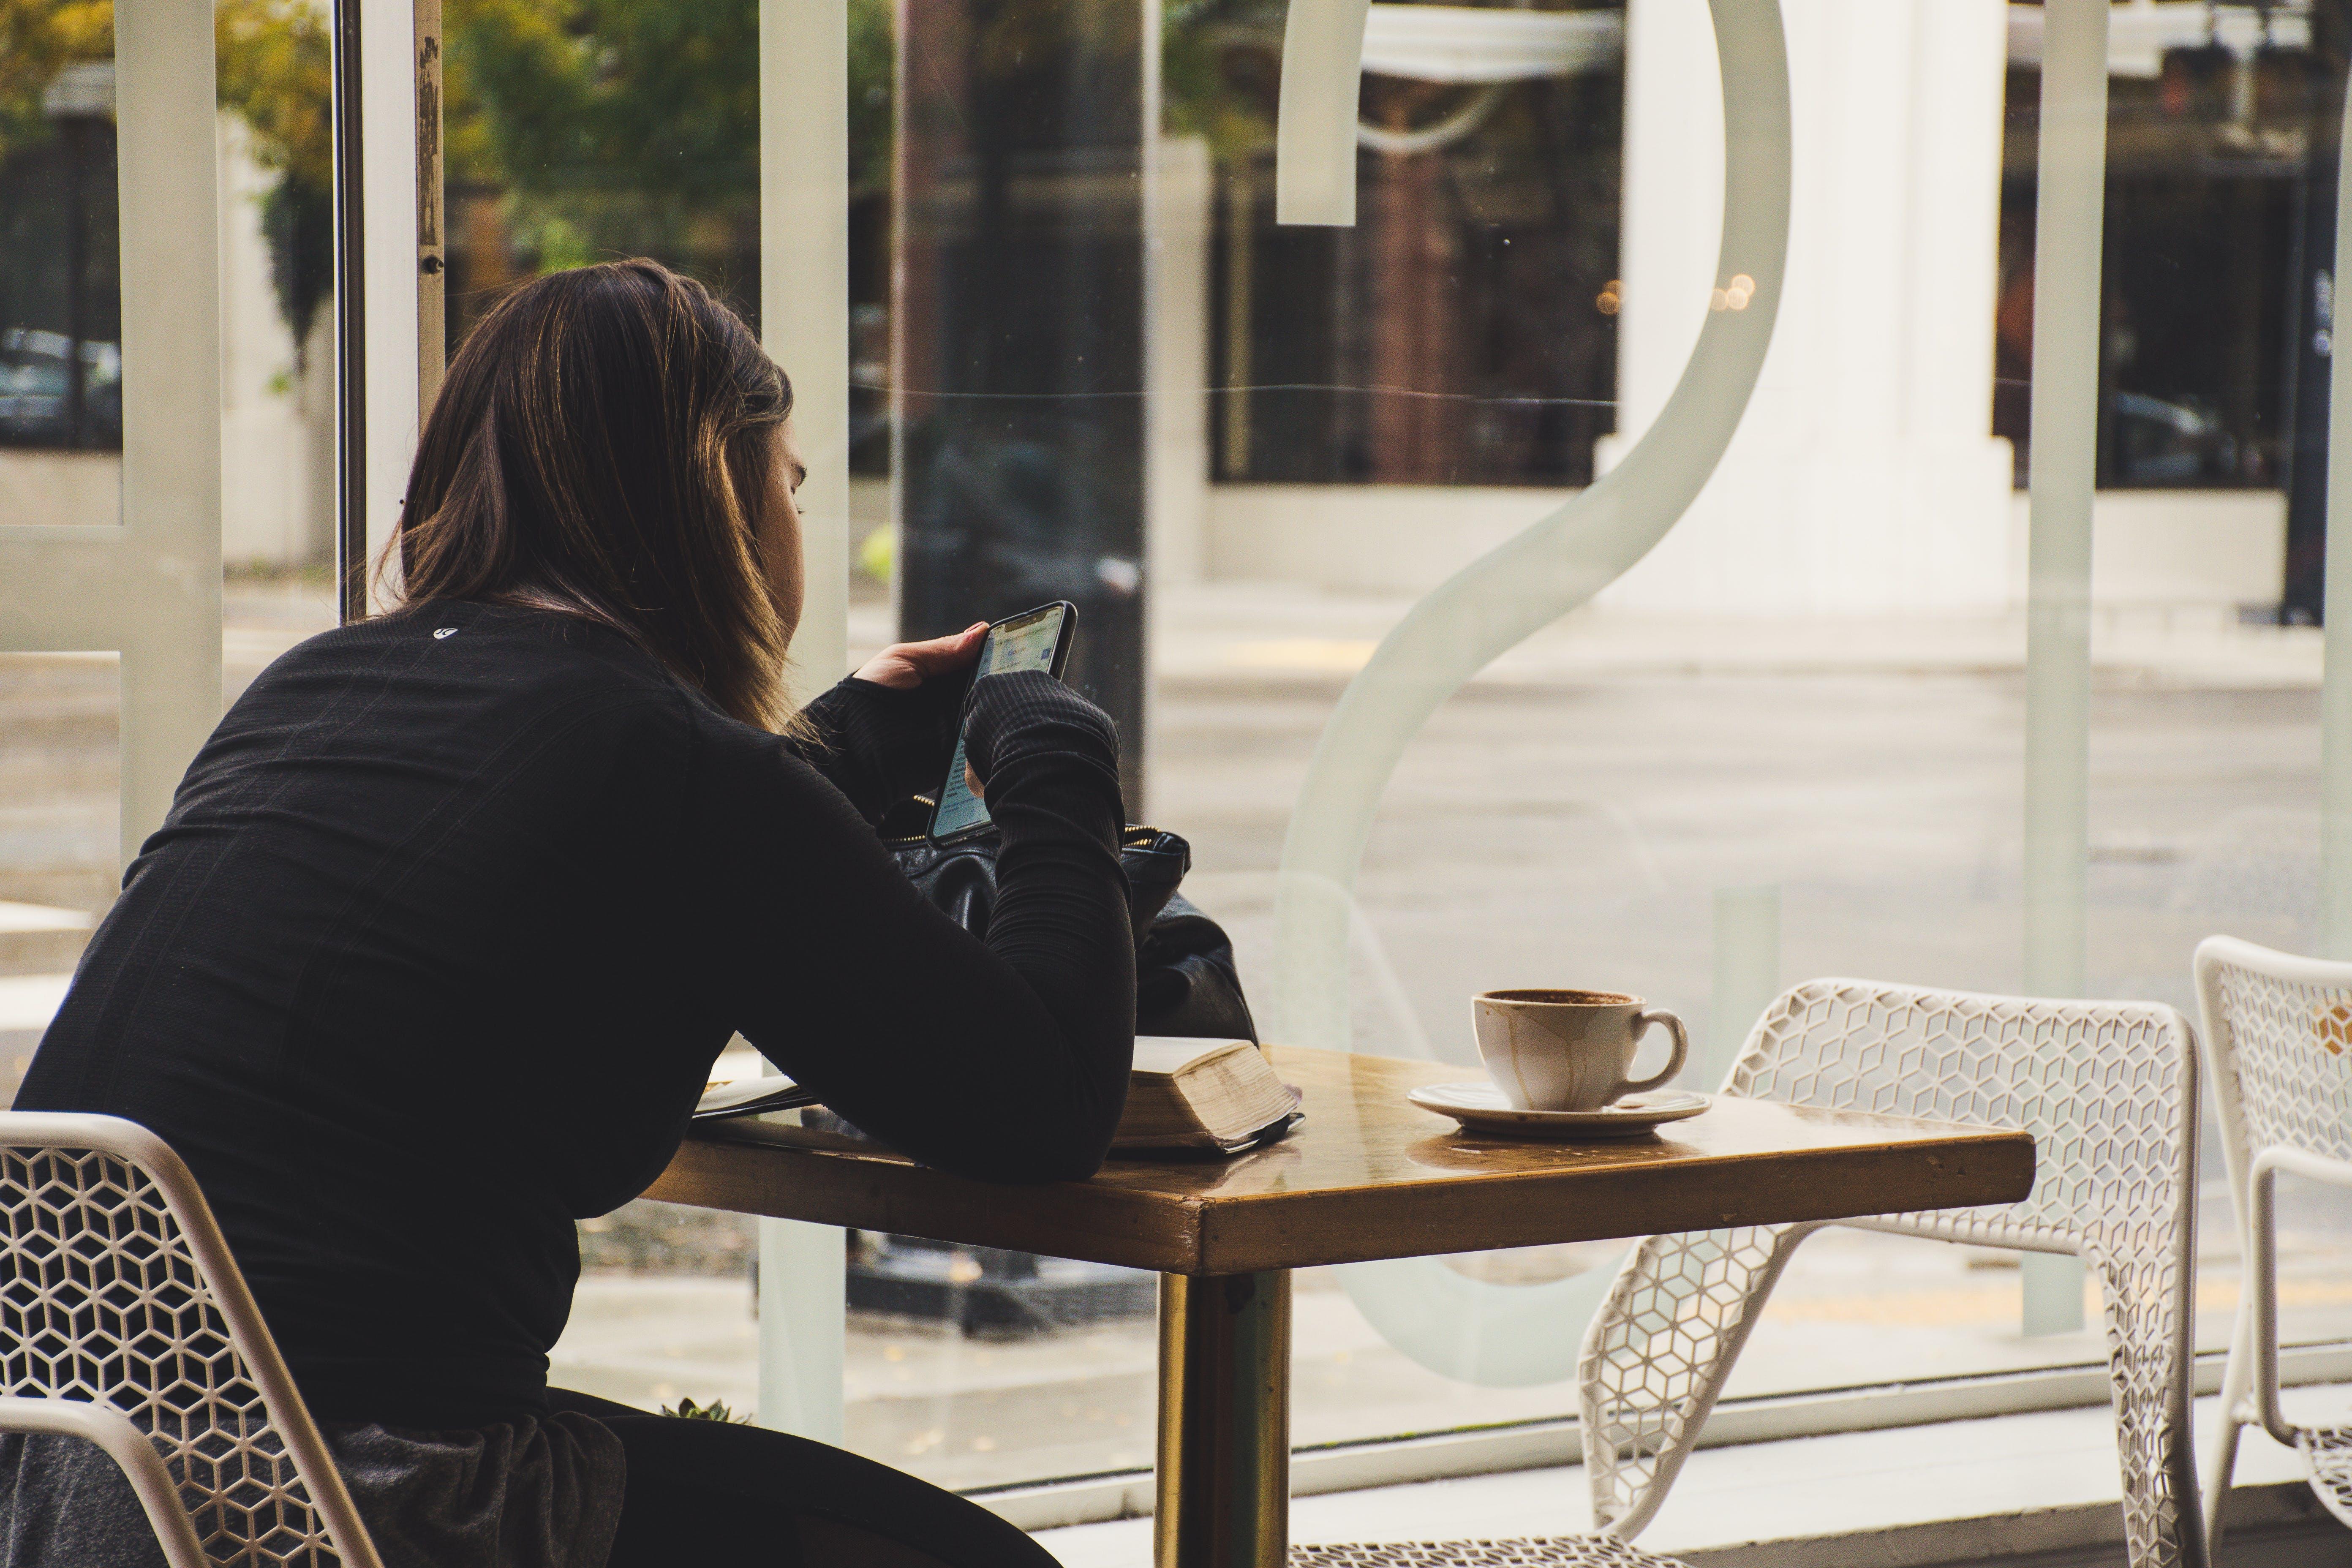 Woman Using Smartphone Inside Coffee Shop